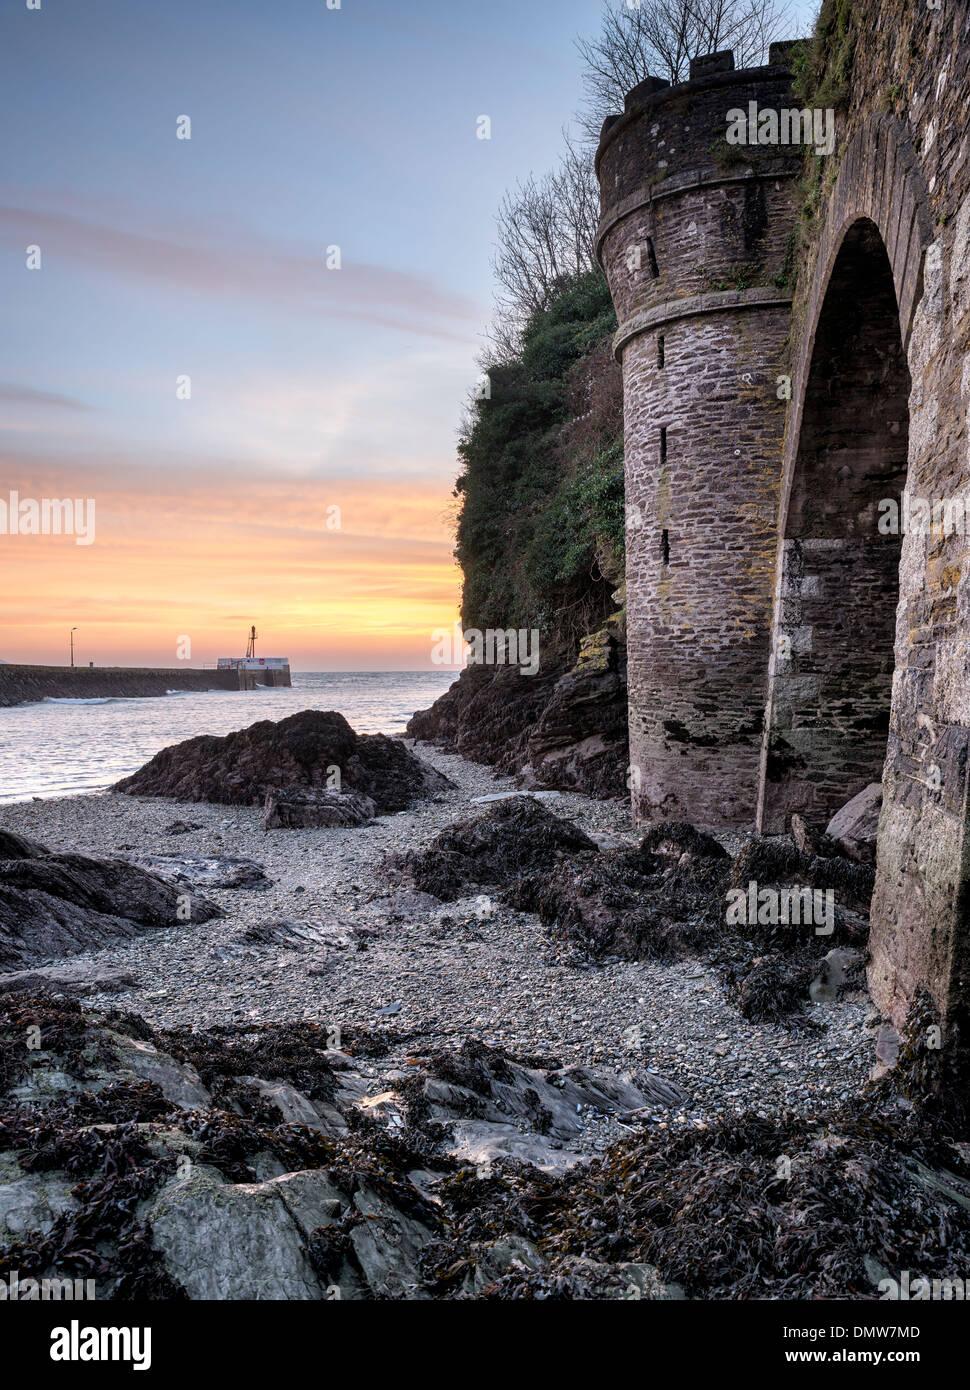 Seaside fishing village of Looe on the south coast of Cornwall - Stock Image